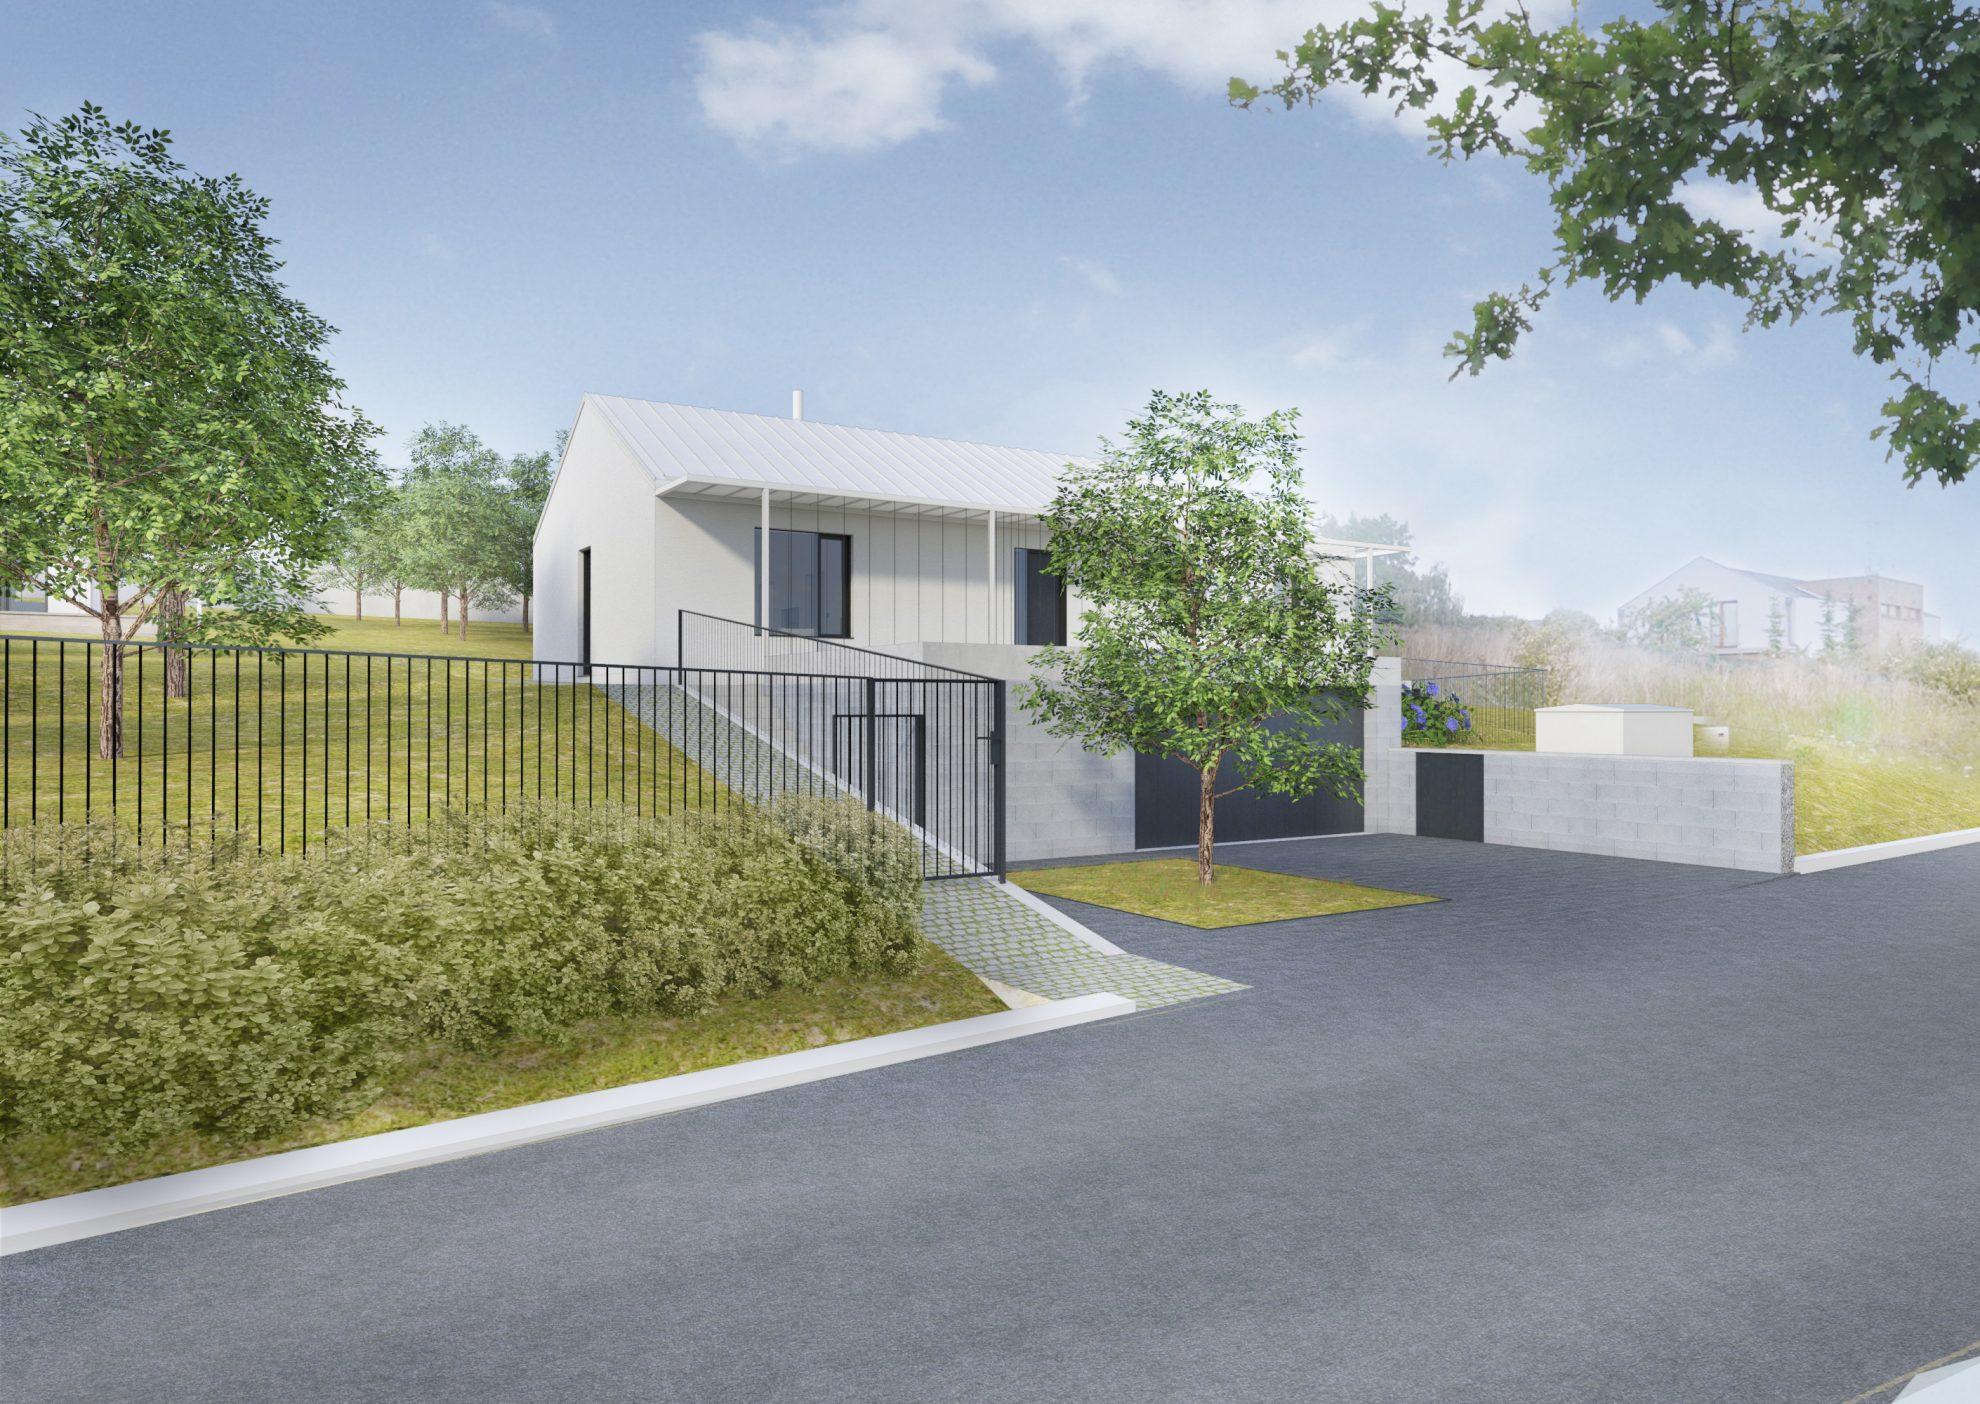 House Kladno II - monom on house bill of lading sample, house cl, house na, house sp,